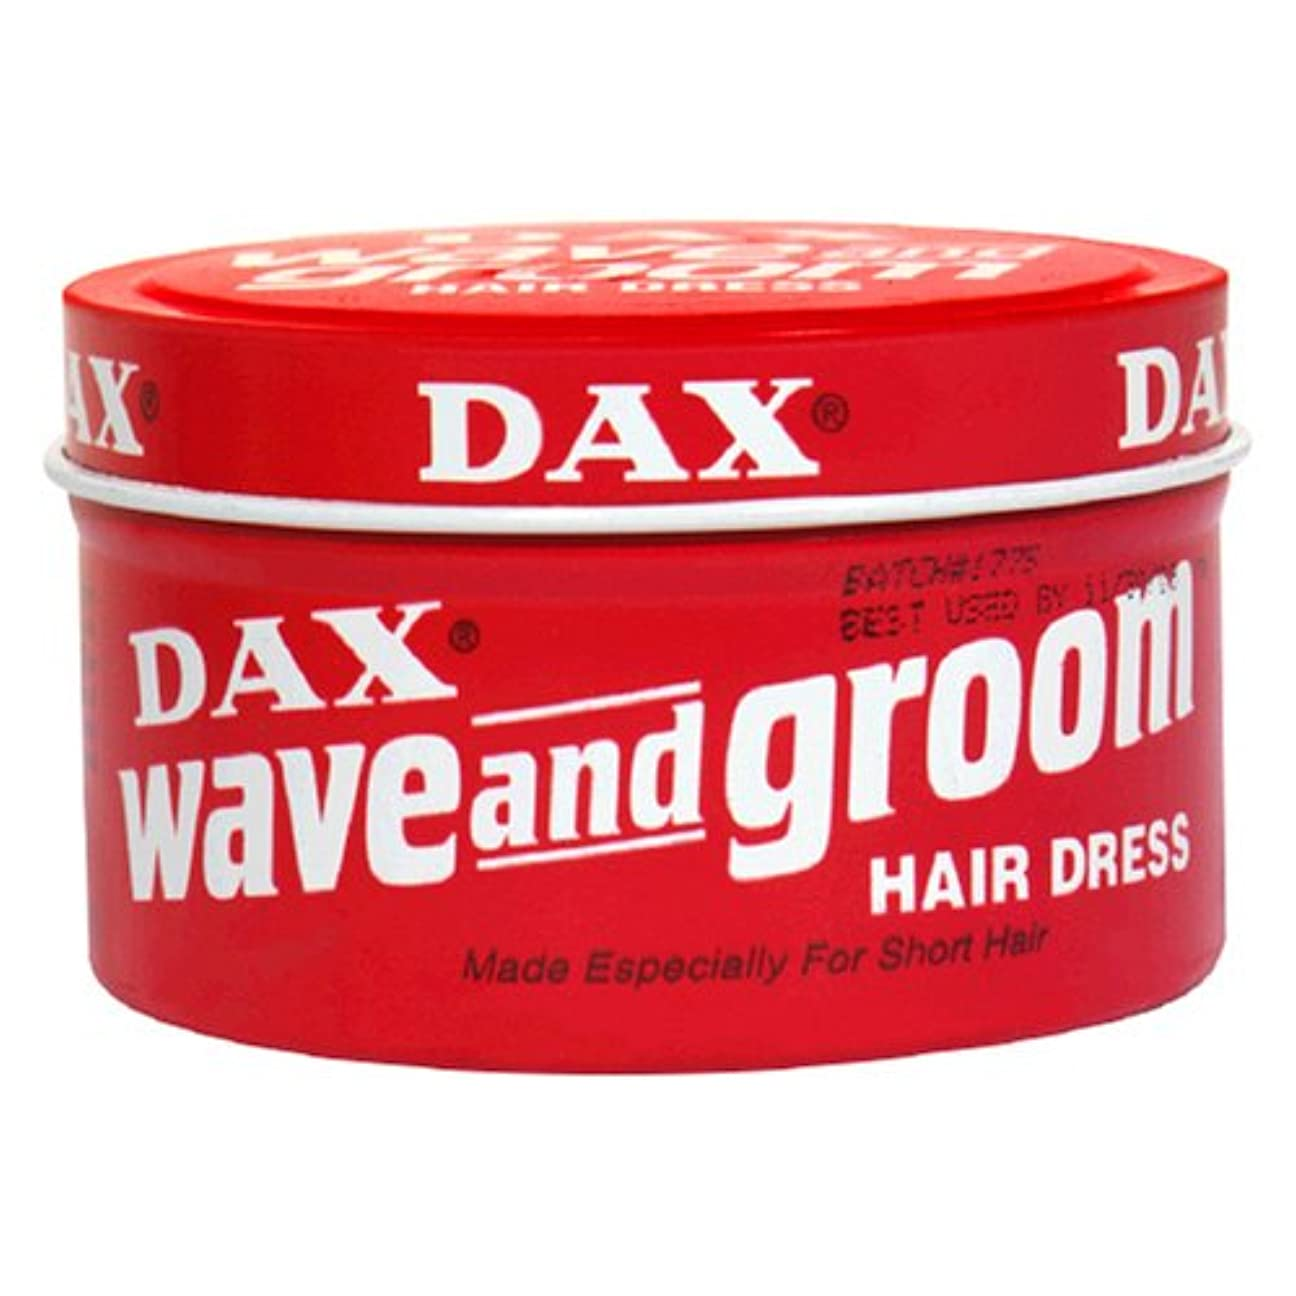 入浴実質的に子犬Dax Wave & Groom Hair Dress 99 gm Jar (Case of 6) (並行輸入品)